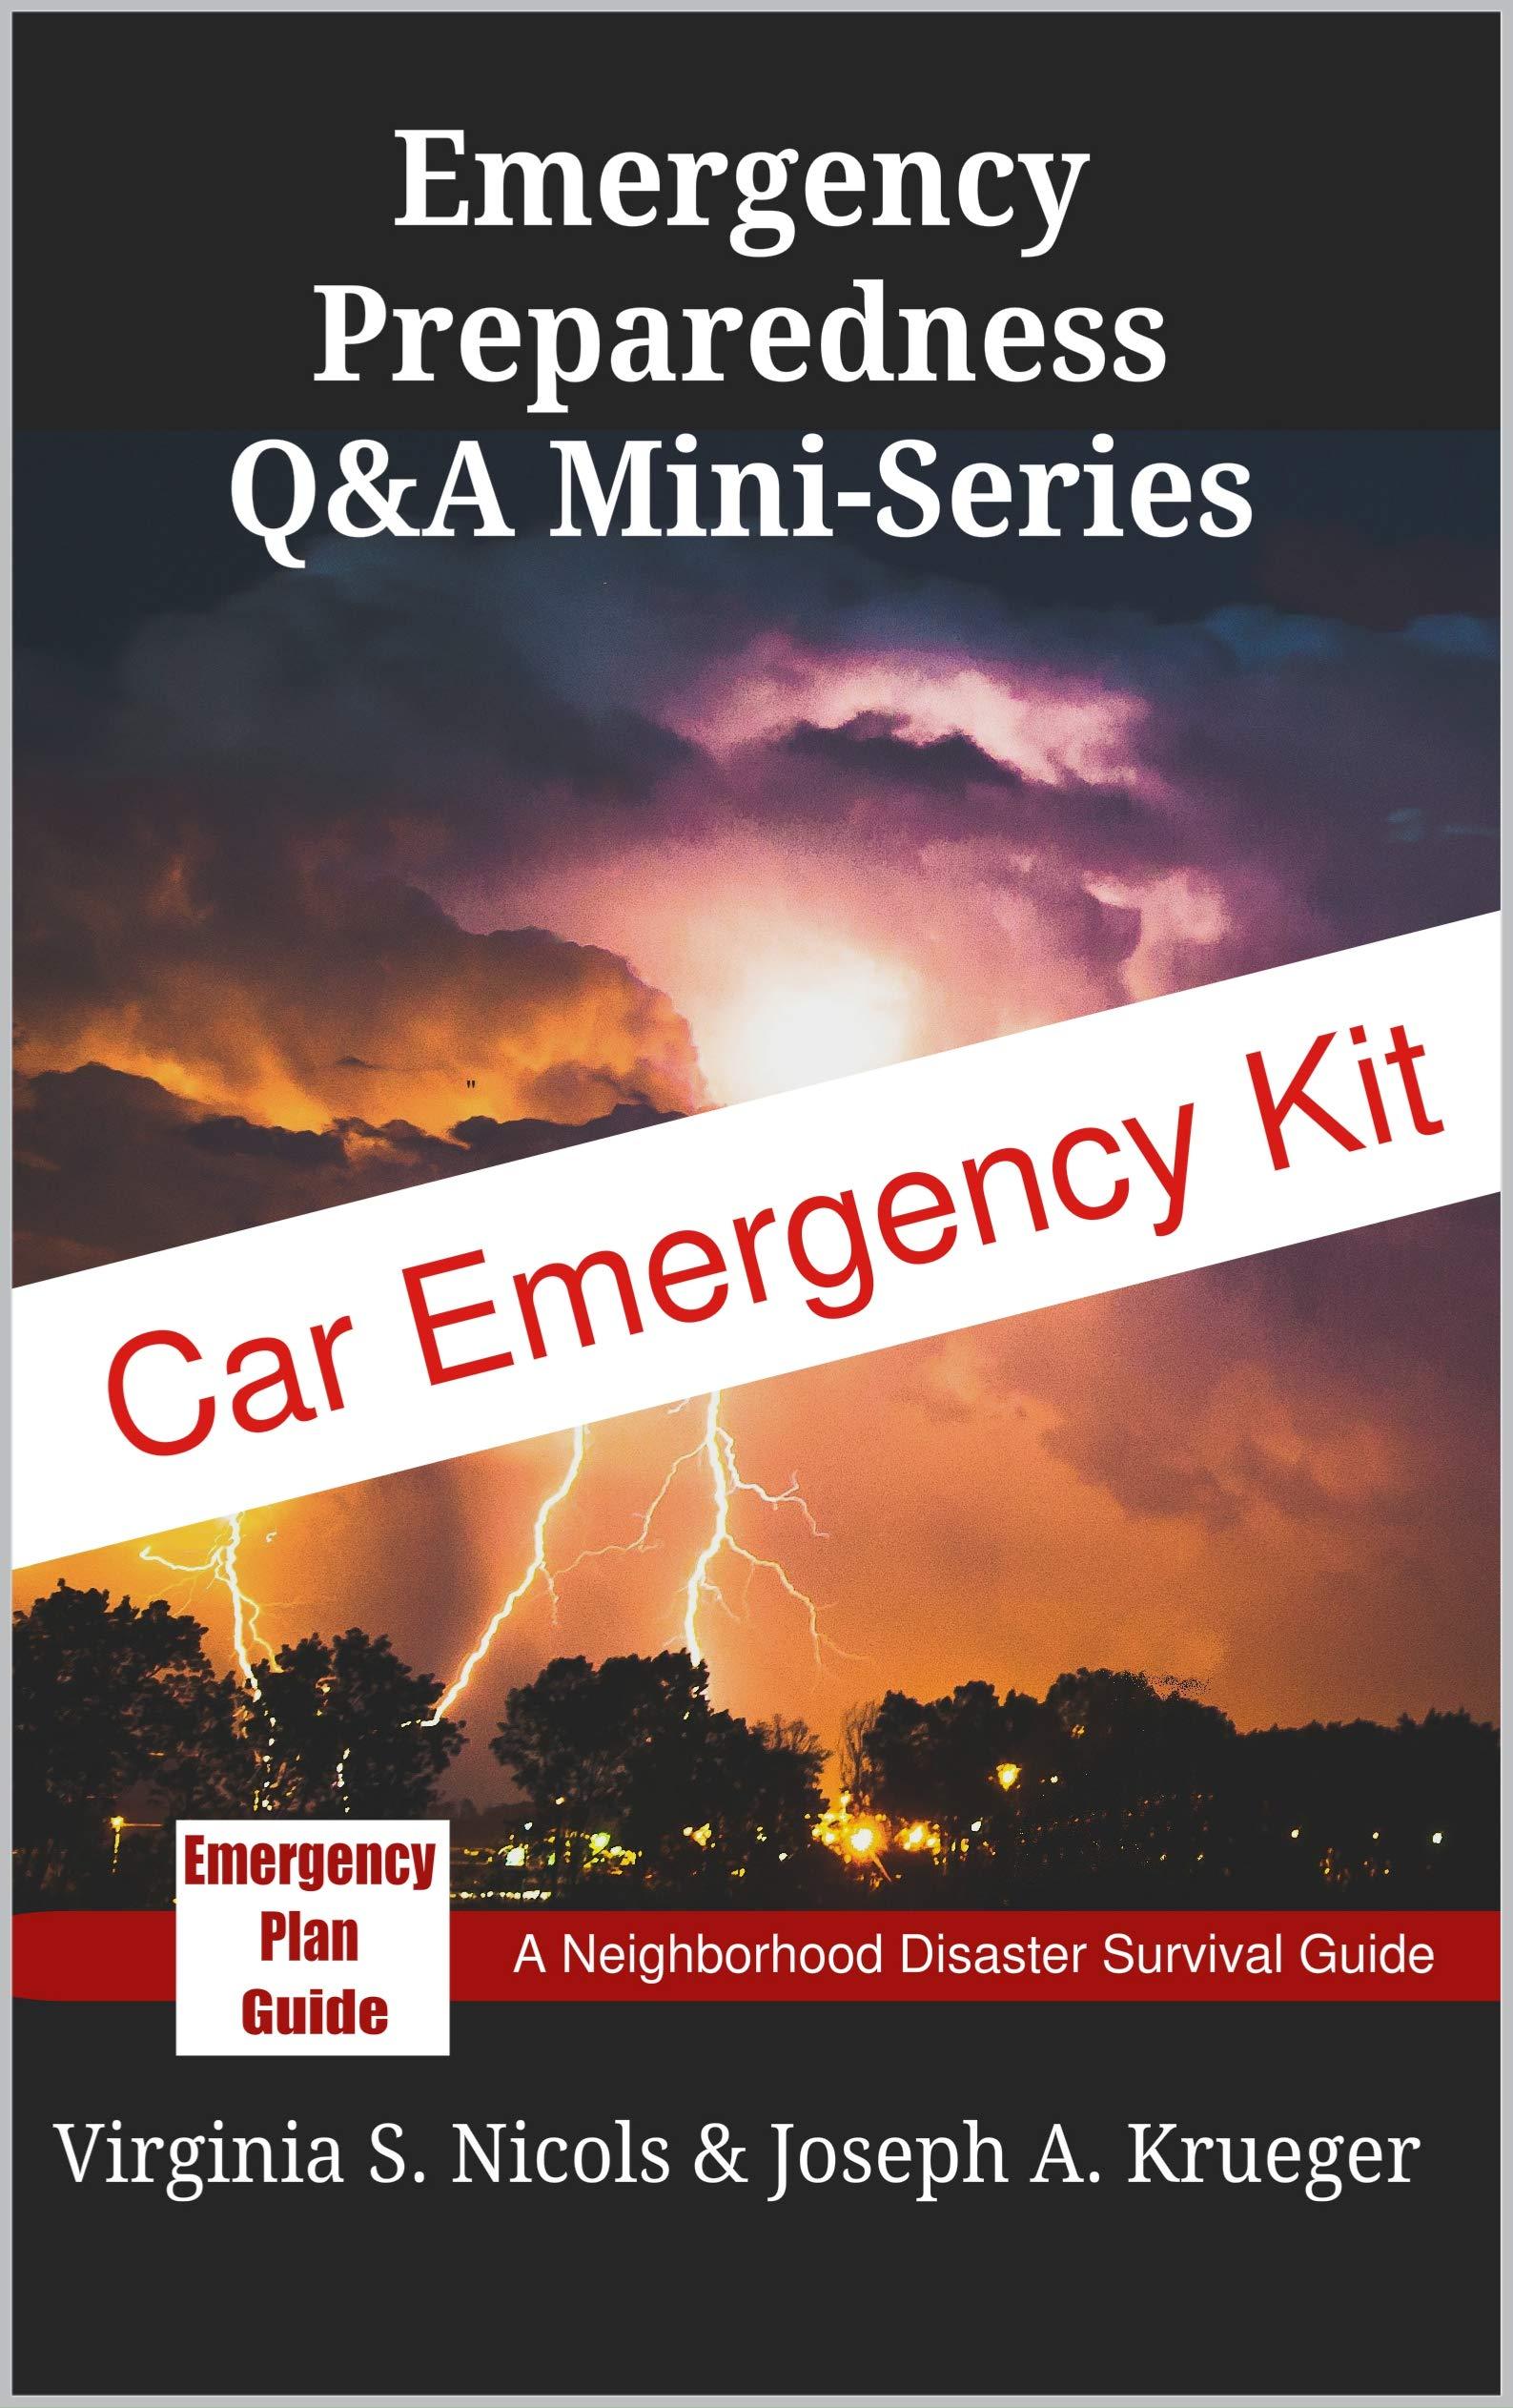 Car Emergency Kit: Emergency Plan Guide Q&A Mini-Series (Personal Preparedness Mini-Series Book 8)